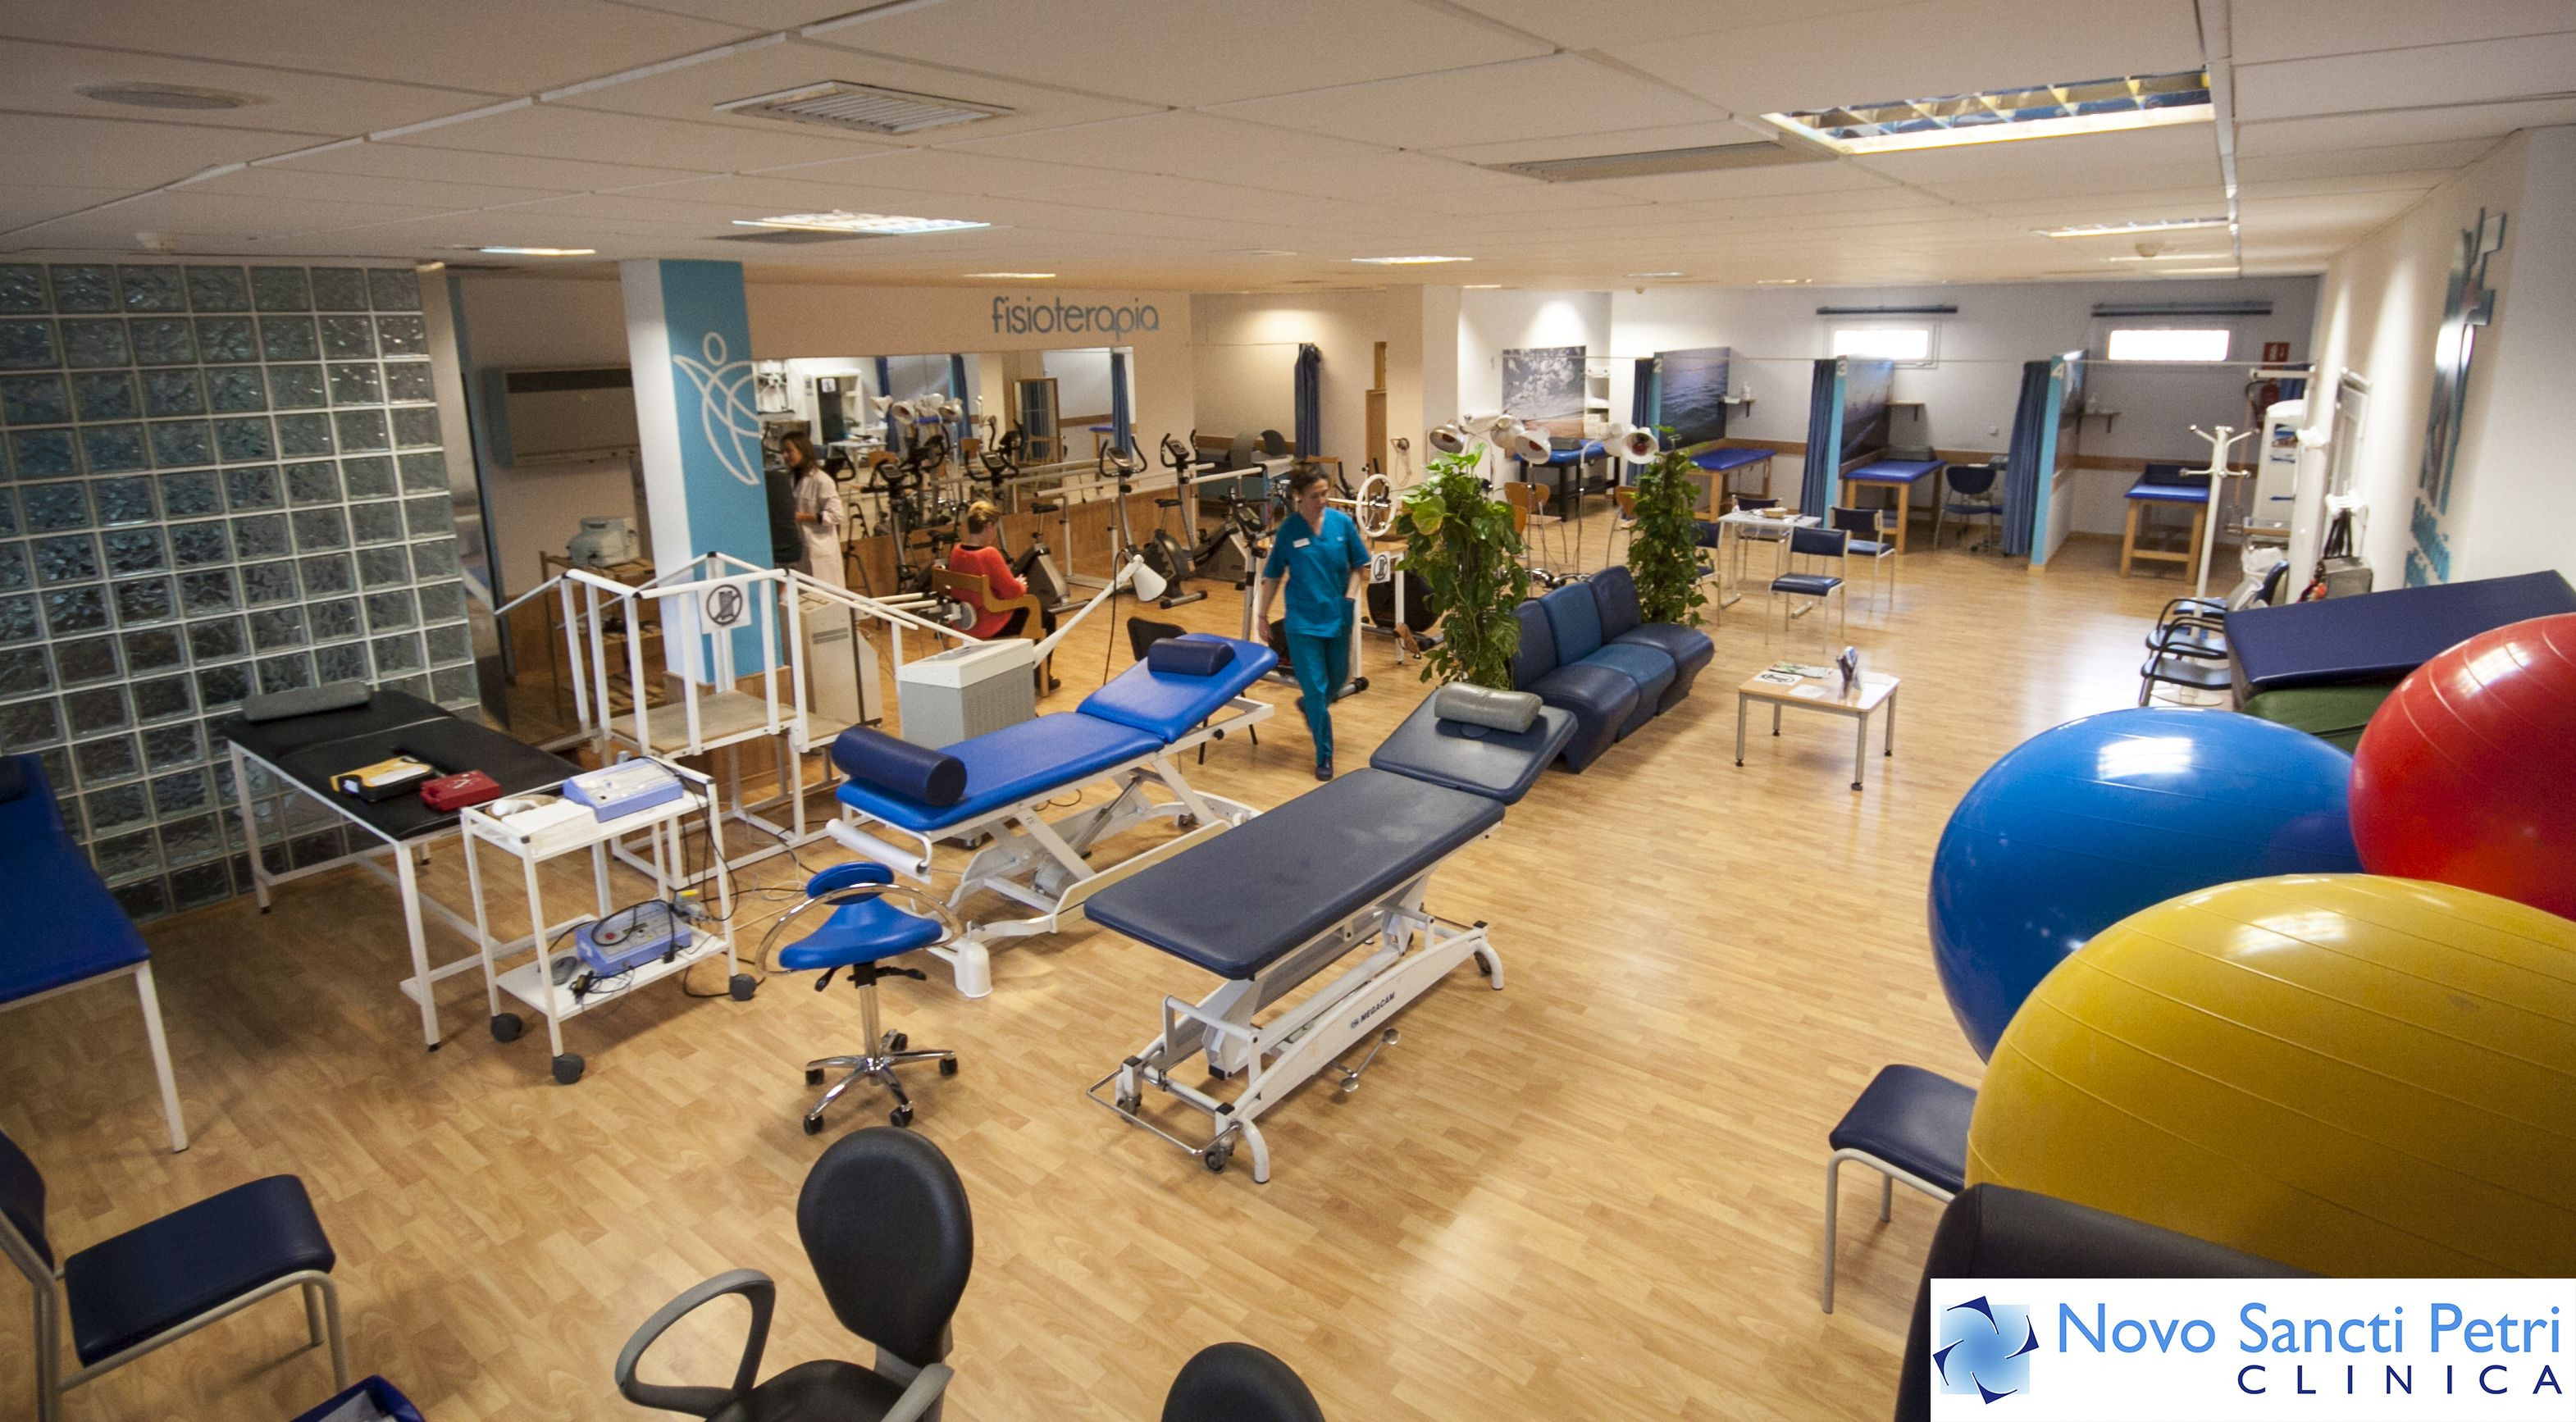 la mejor clinica de fisioterapia - Buscar con Google